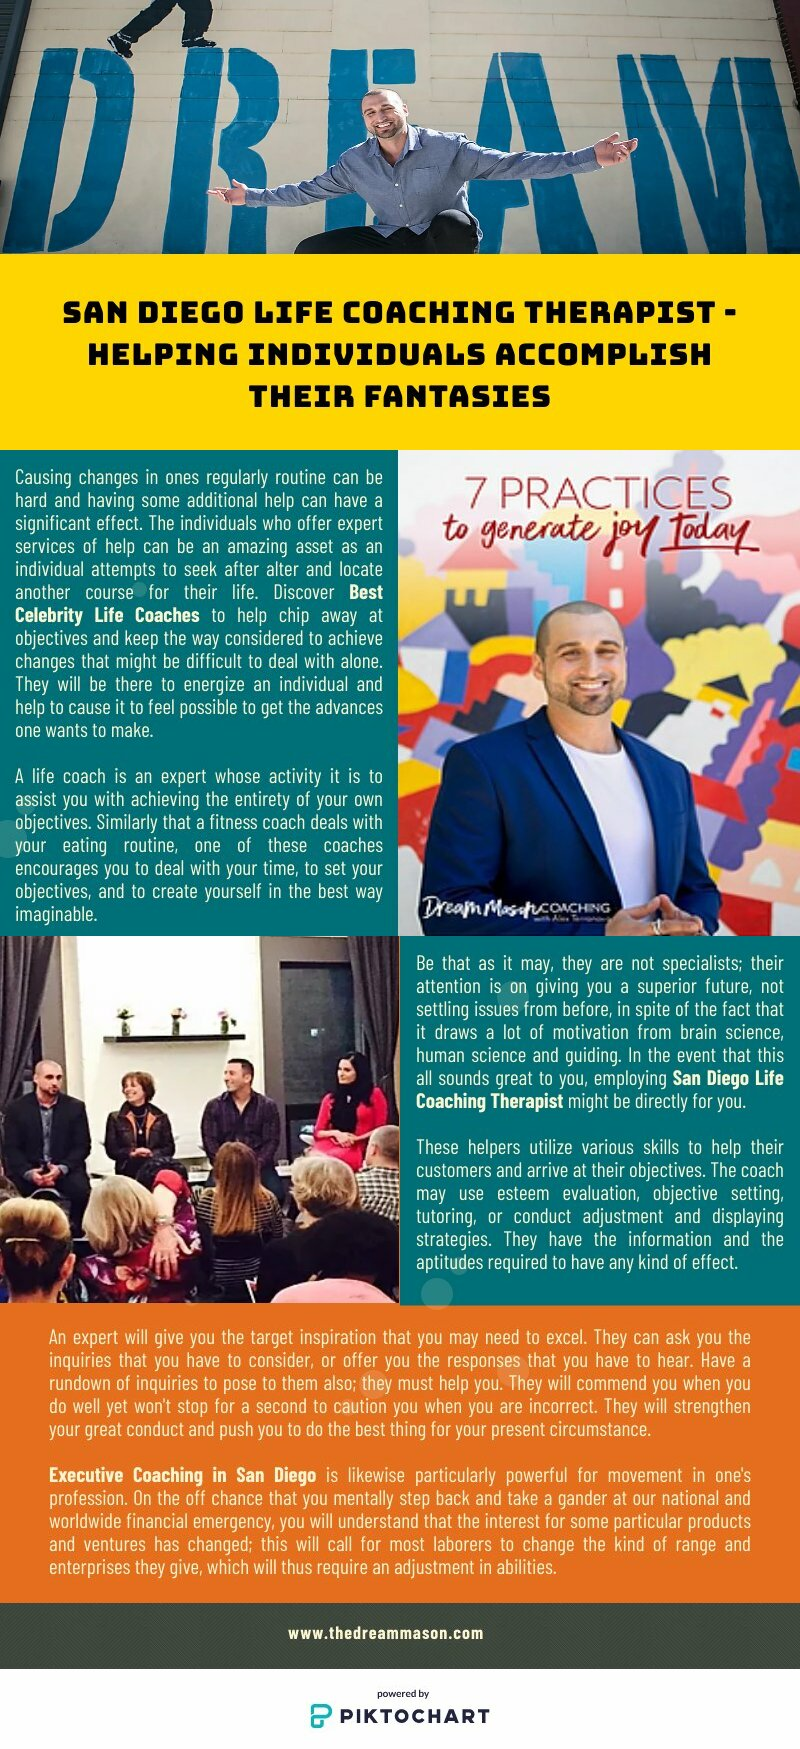 San Diego Life Coaching Therapist - Helping Individuals Accomplish Their Fantasies